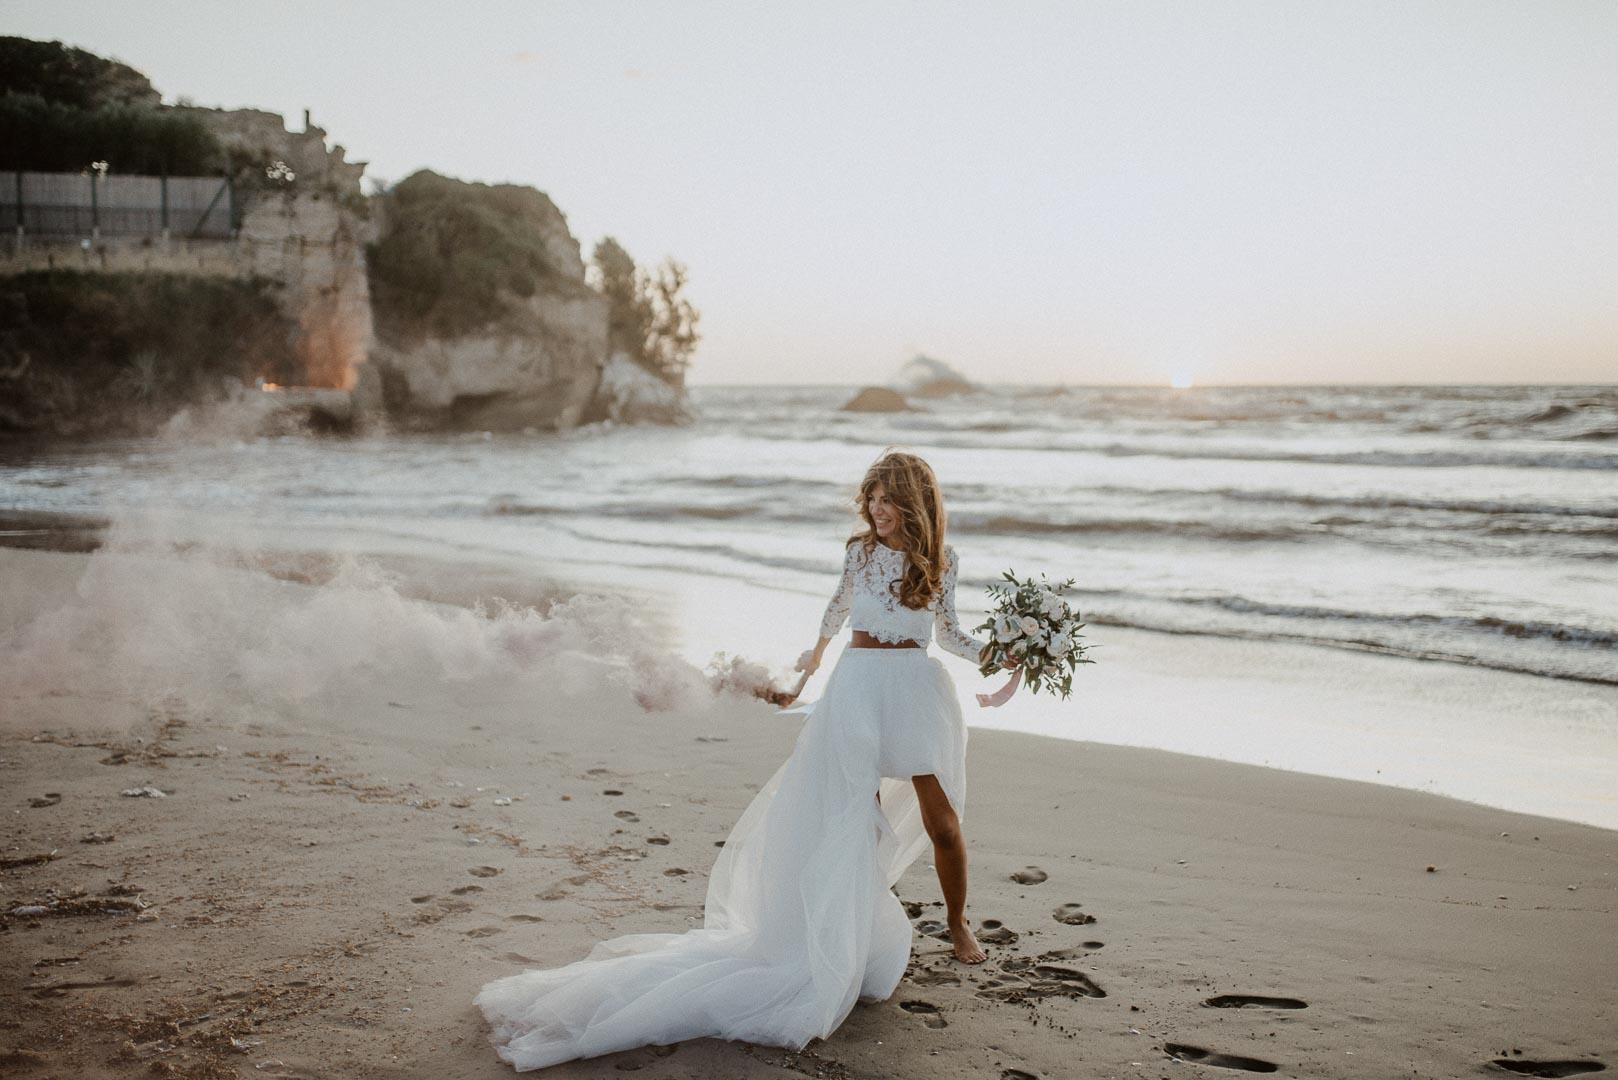 wedding-photographer-destination-fineart-bespoke-reportage-napoli-nabilah-vivianeizzo-spazio46-145